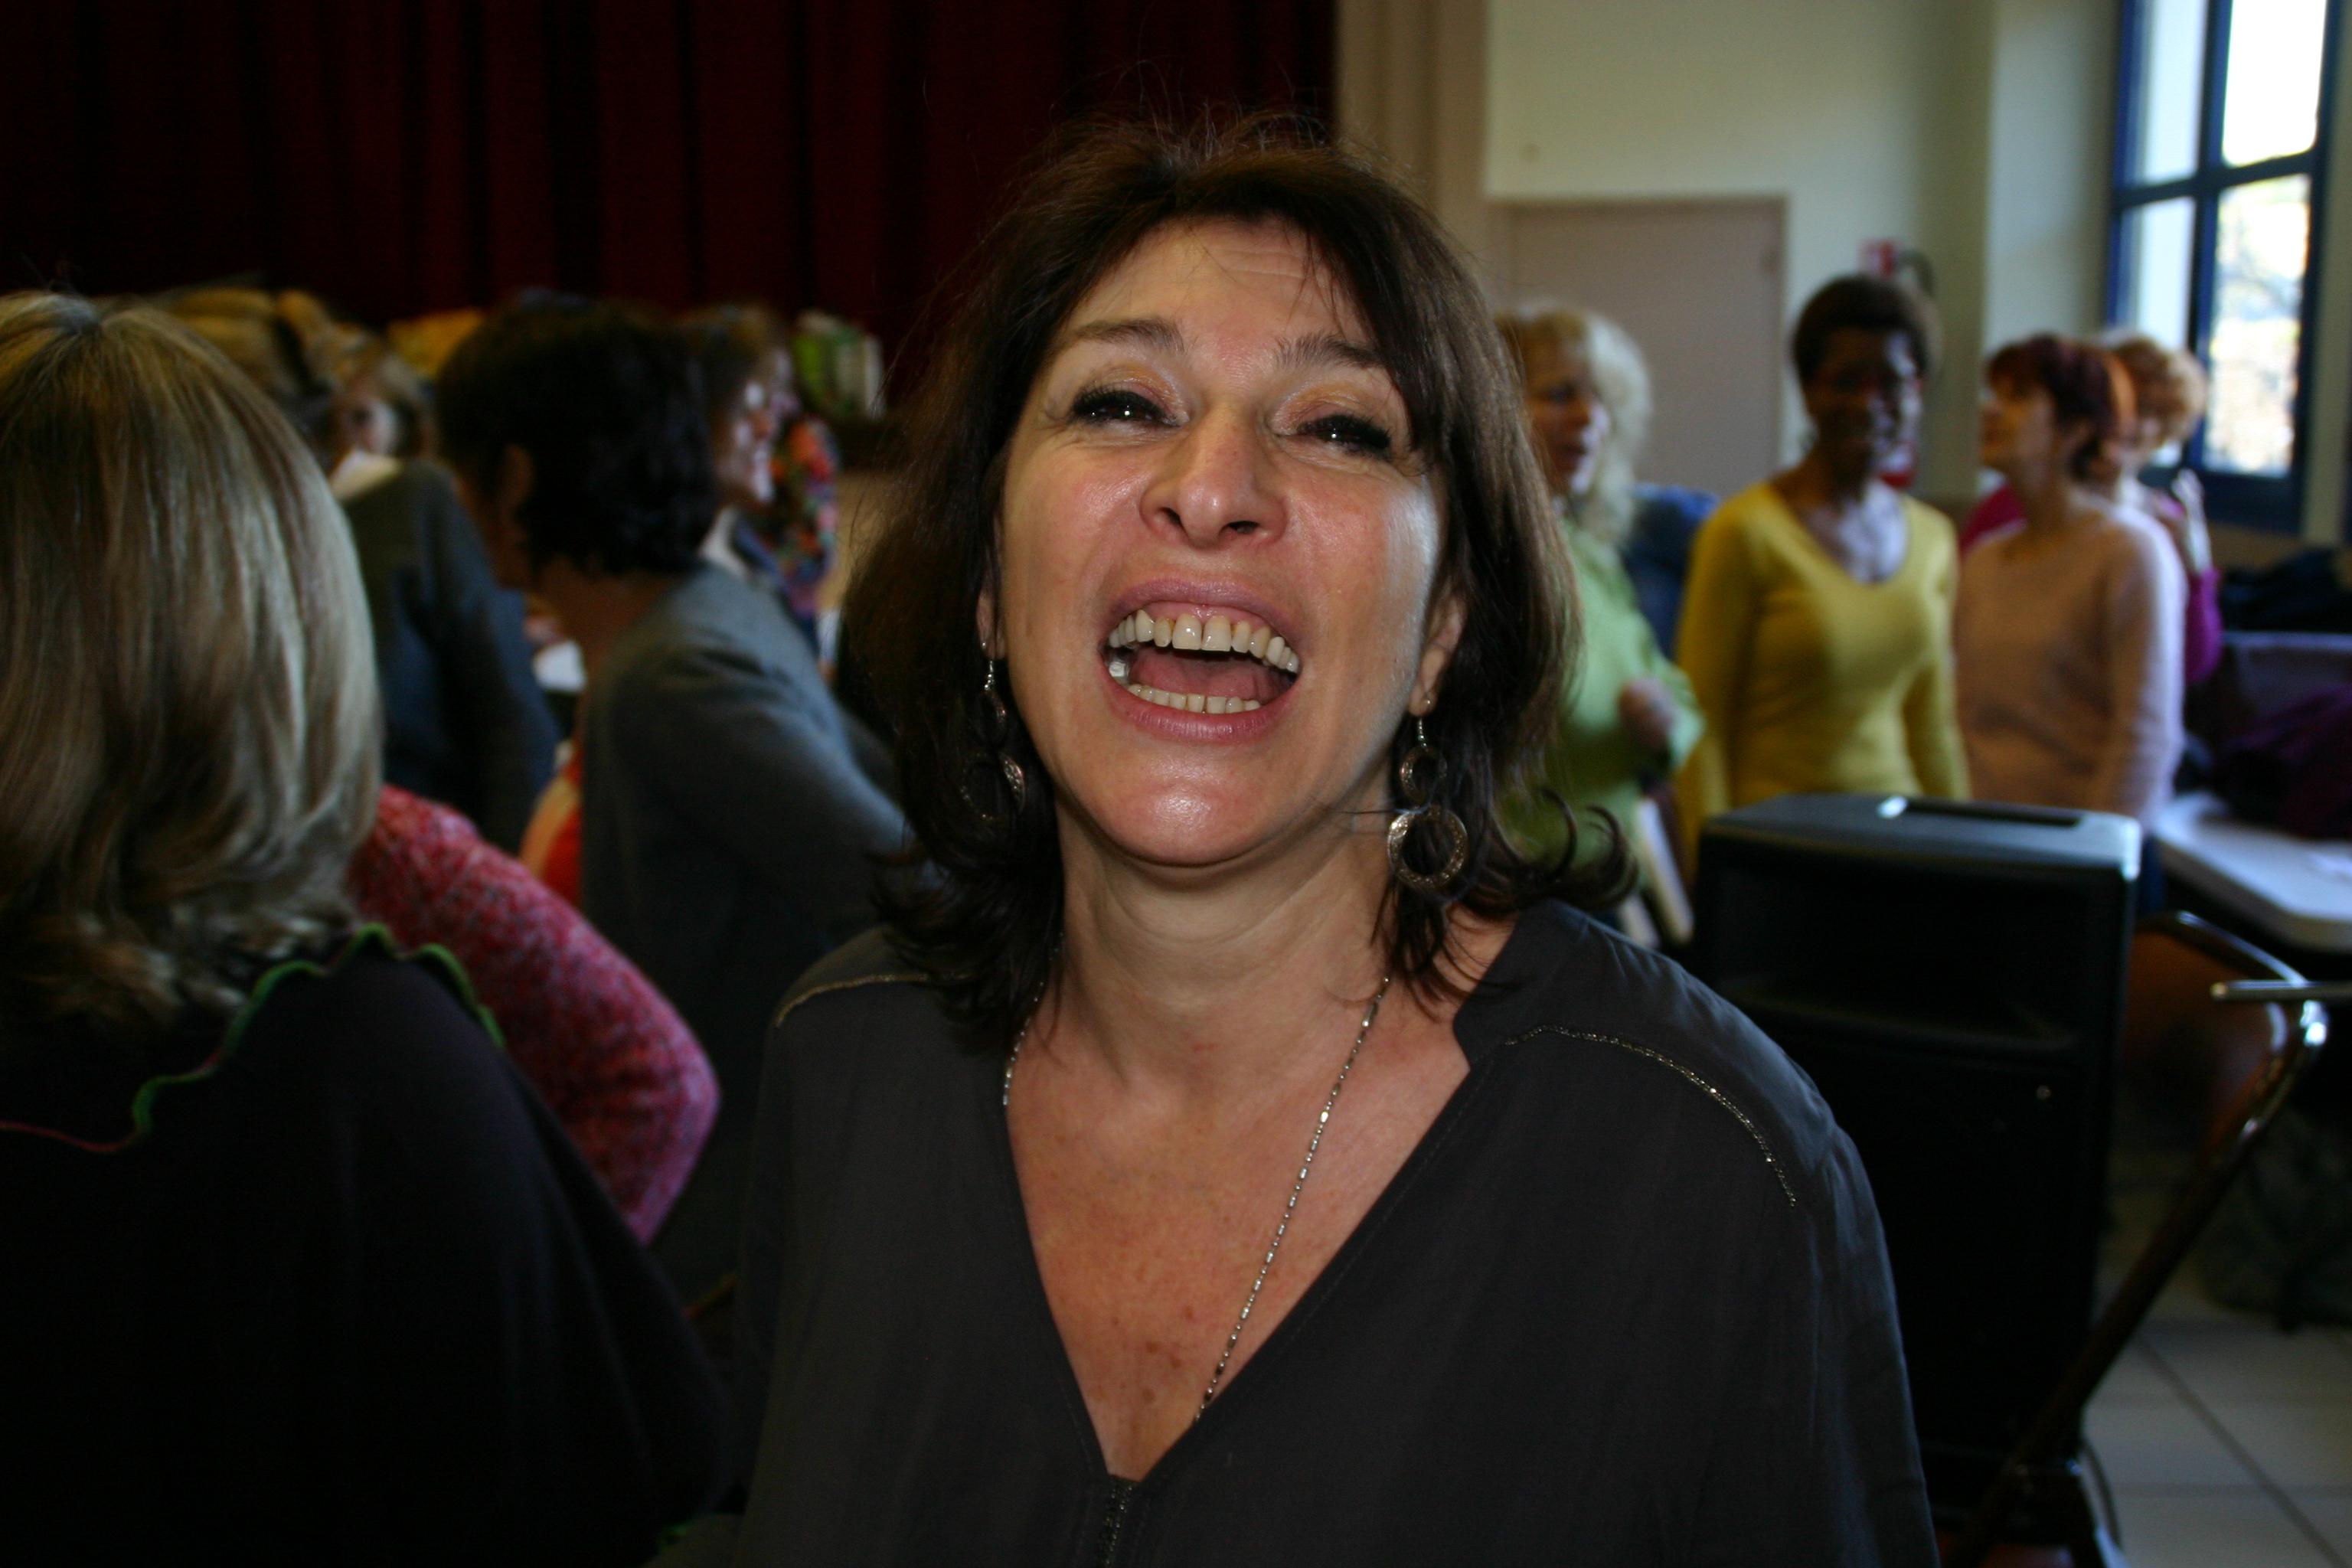 Evènement Emmanuel Djob va diriger 500 choristes à Montpellier